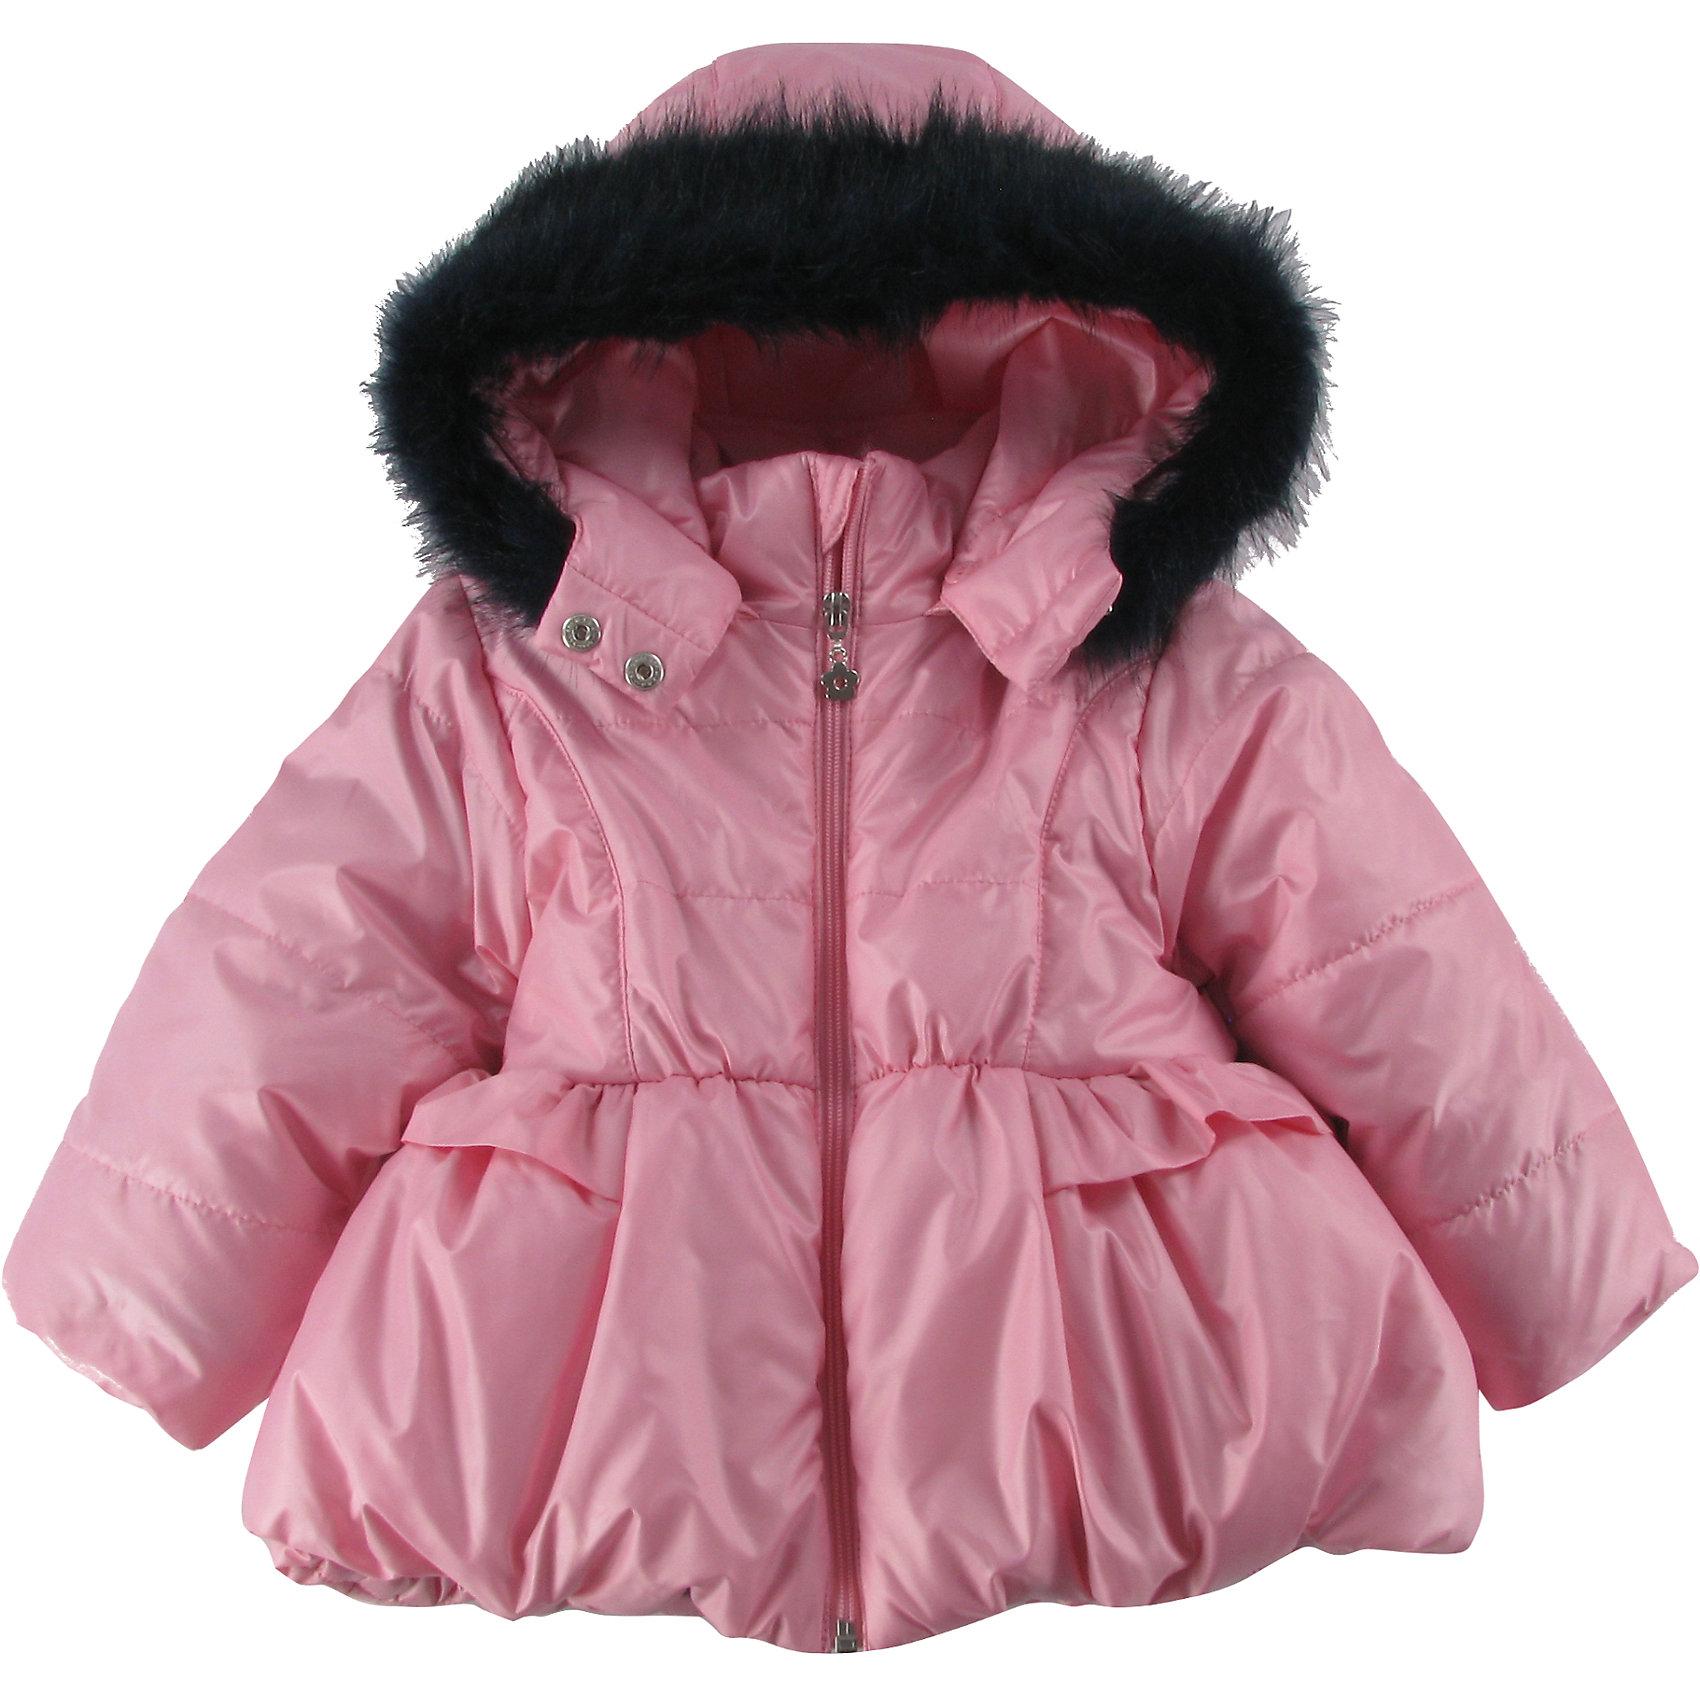 Куртка утепленная для девочки WojcikВерхняя одежда<br>Куртка утепленная для девочки Wojcik<br>Состав:<br>Полиэстер 100%<br><br>Ширина мм: 356<br>Глубина мм: 10<br>Высота мм: 245<br>Вес г: 519<br>Цвет: розовый<br>Возраст от месяцев: 24<br>Возраст до месяцев: 36<br>Пол: Женский<br>Возраст: Детский<br>Размер: 98,74,80,86,92<br>SKU: 5590994